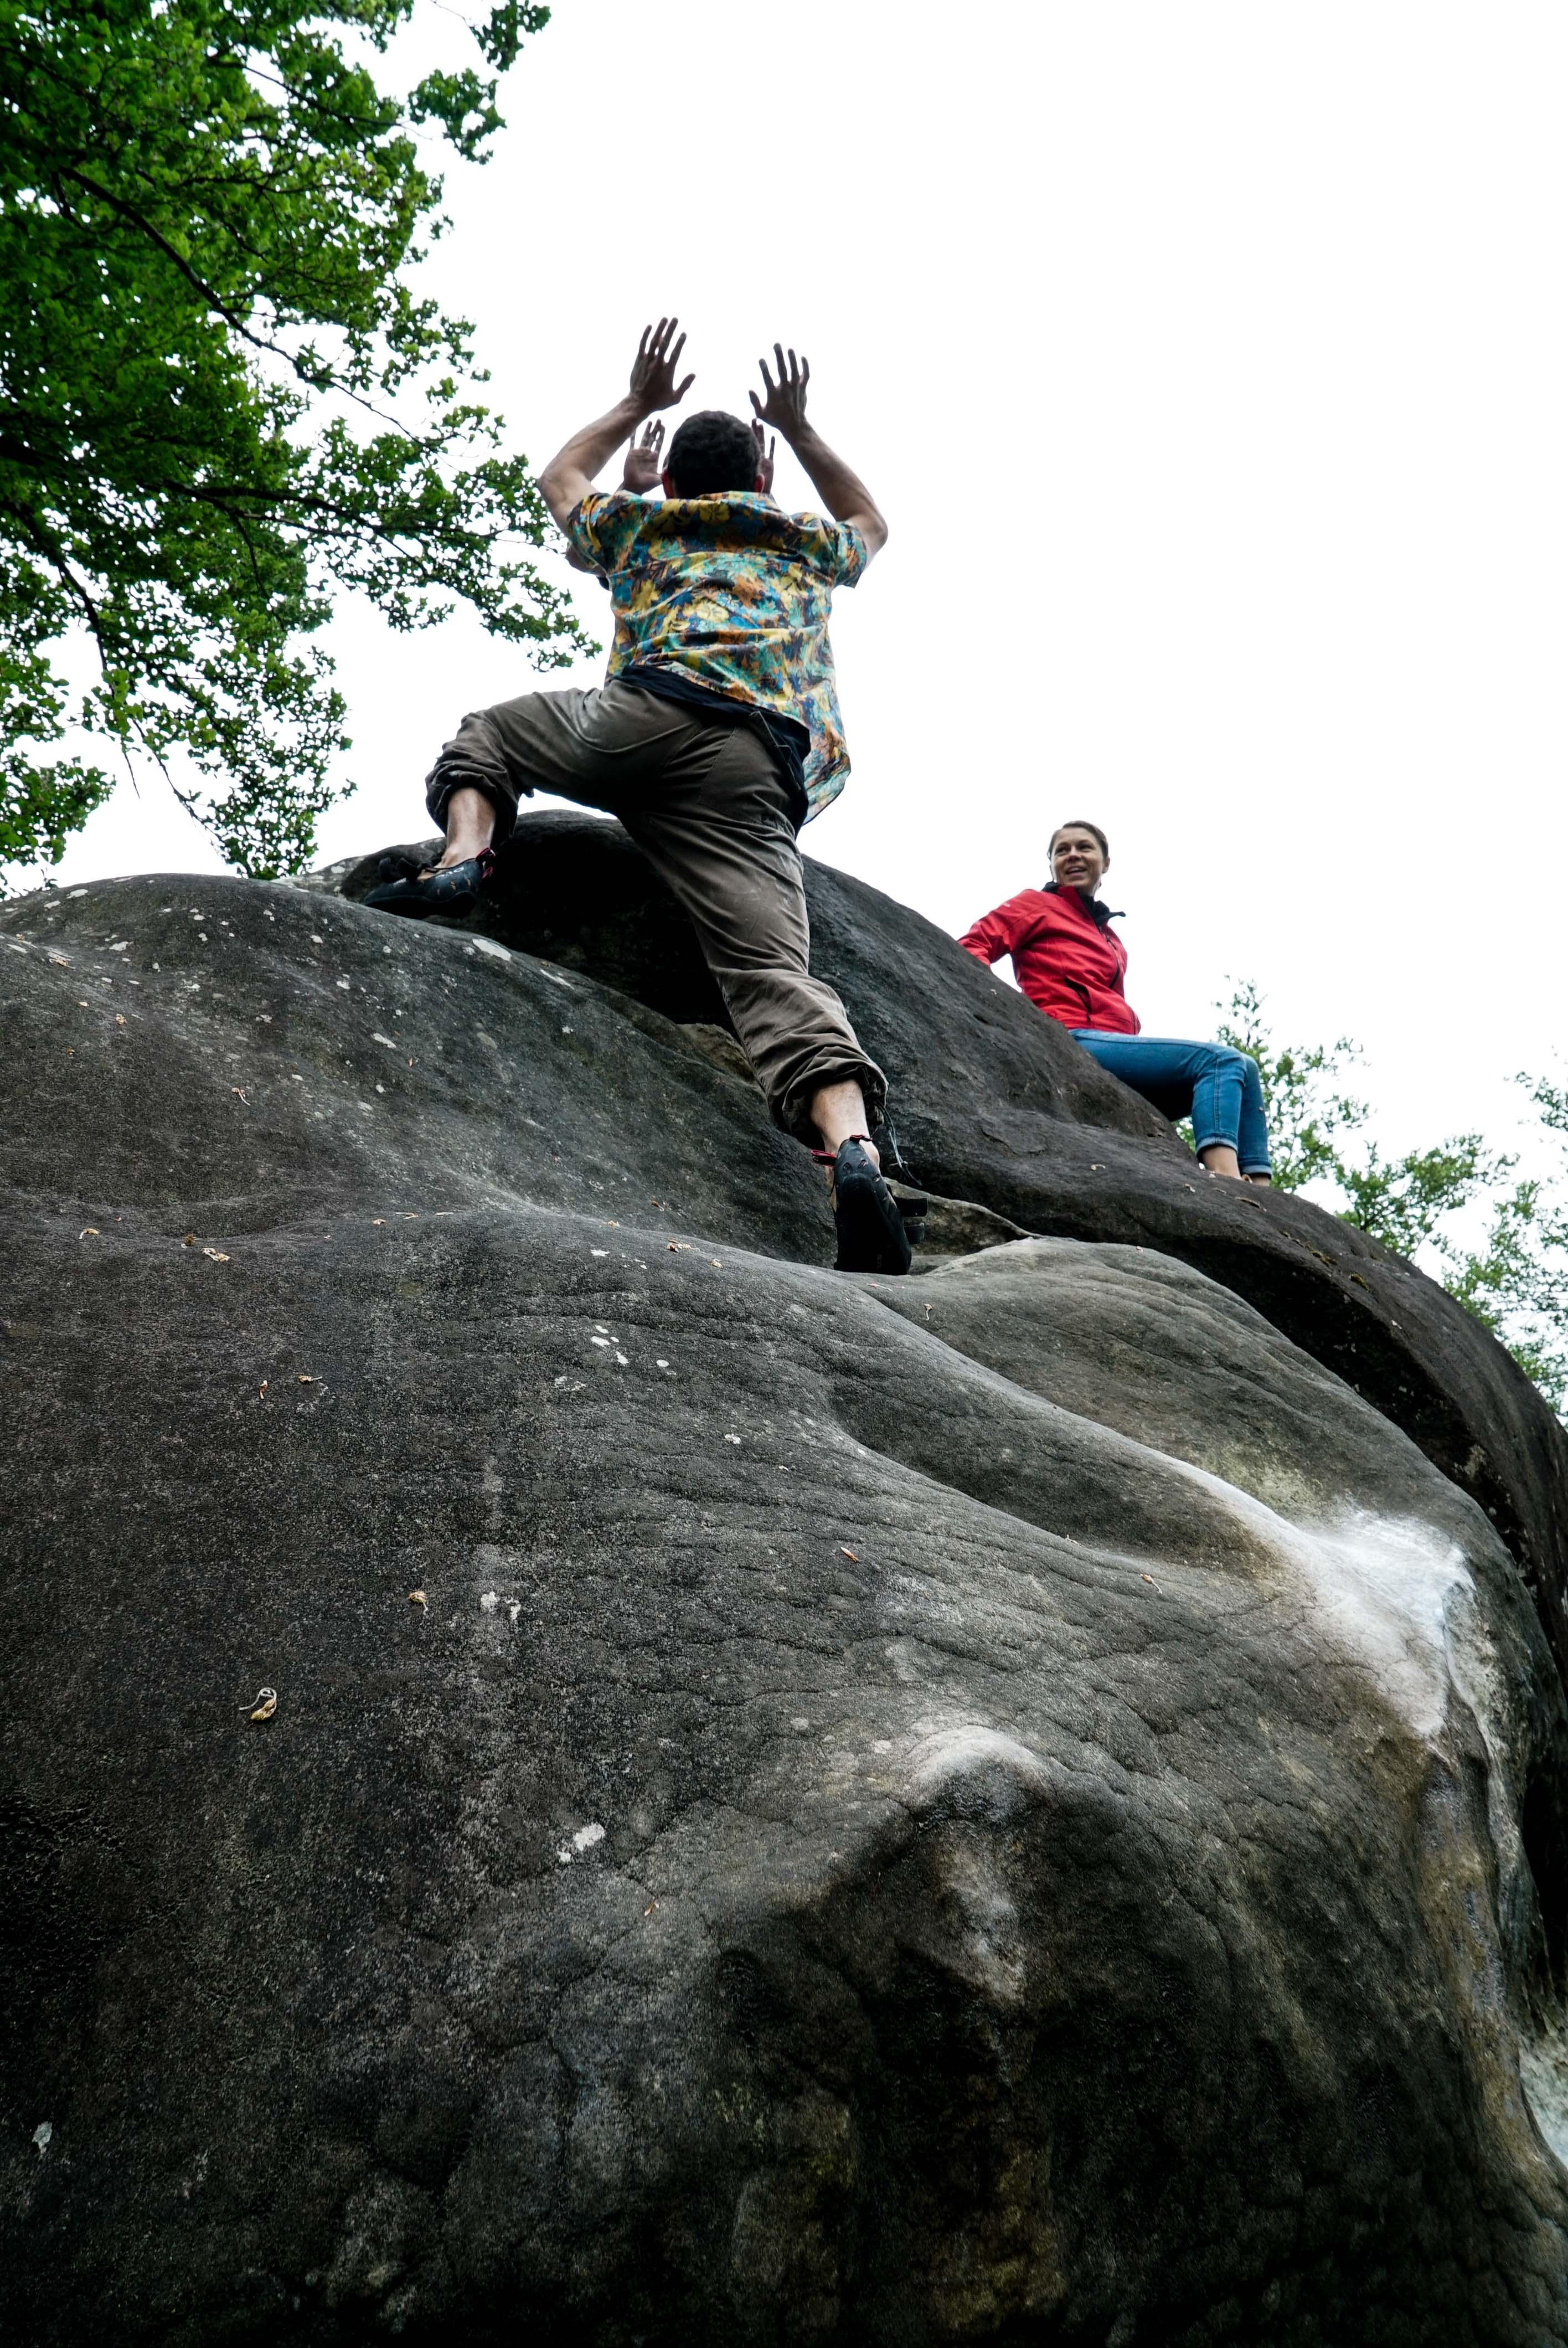 fontainbleau climbing 2016 mike brindley-96